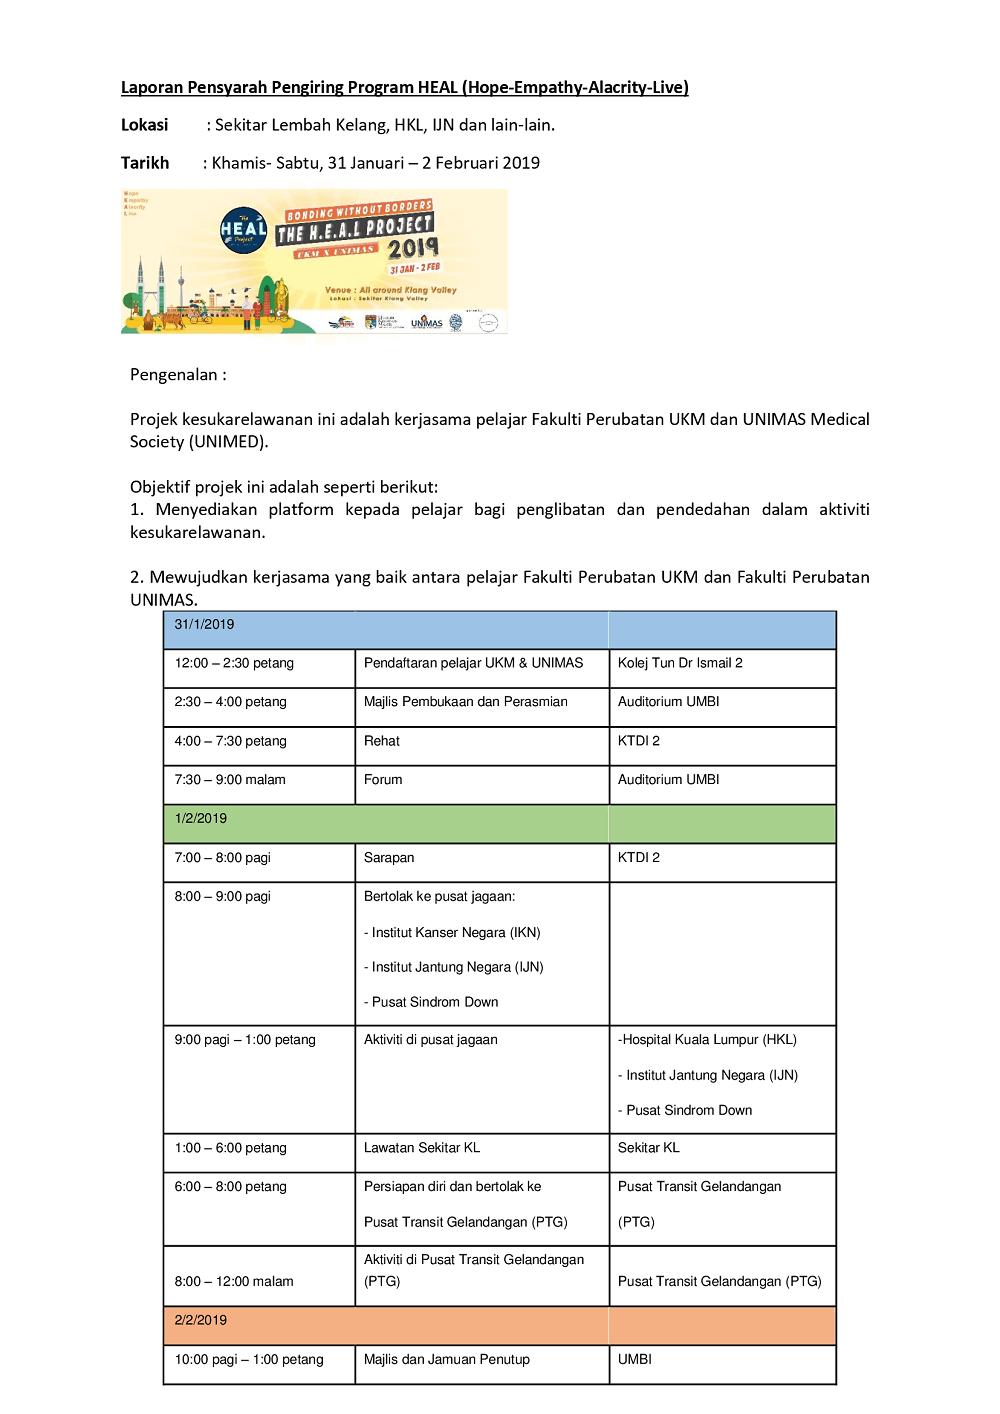 Laporan Pensyarah Pengiring Program HEAL (Hope-Empathy